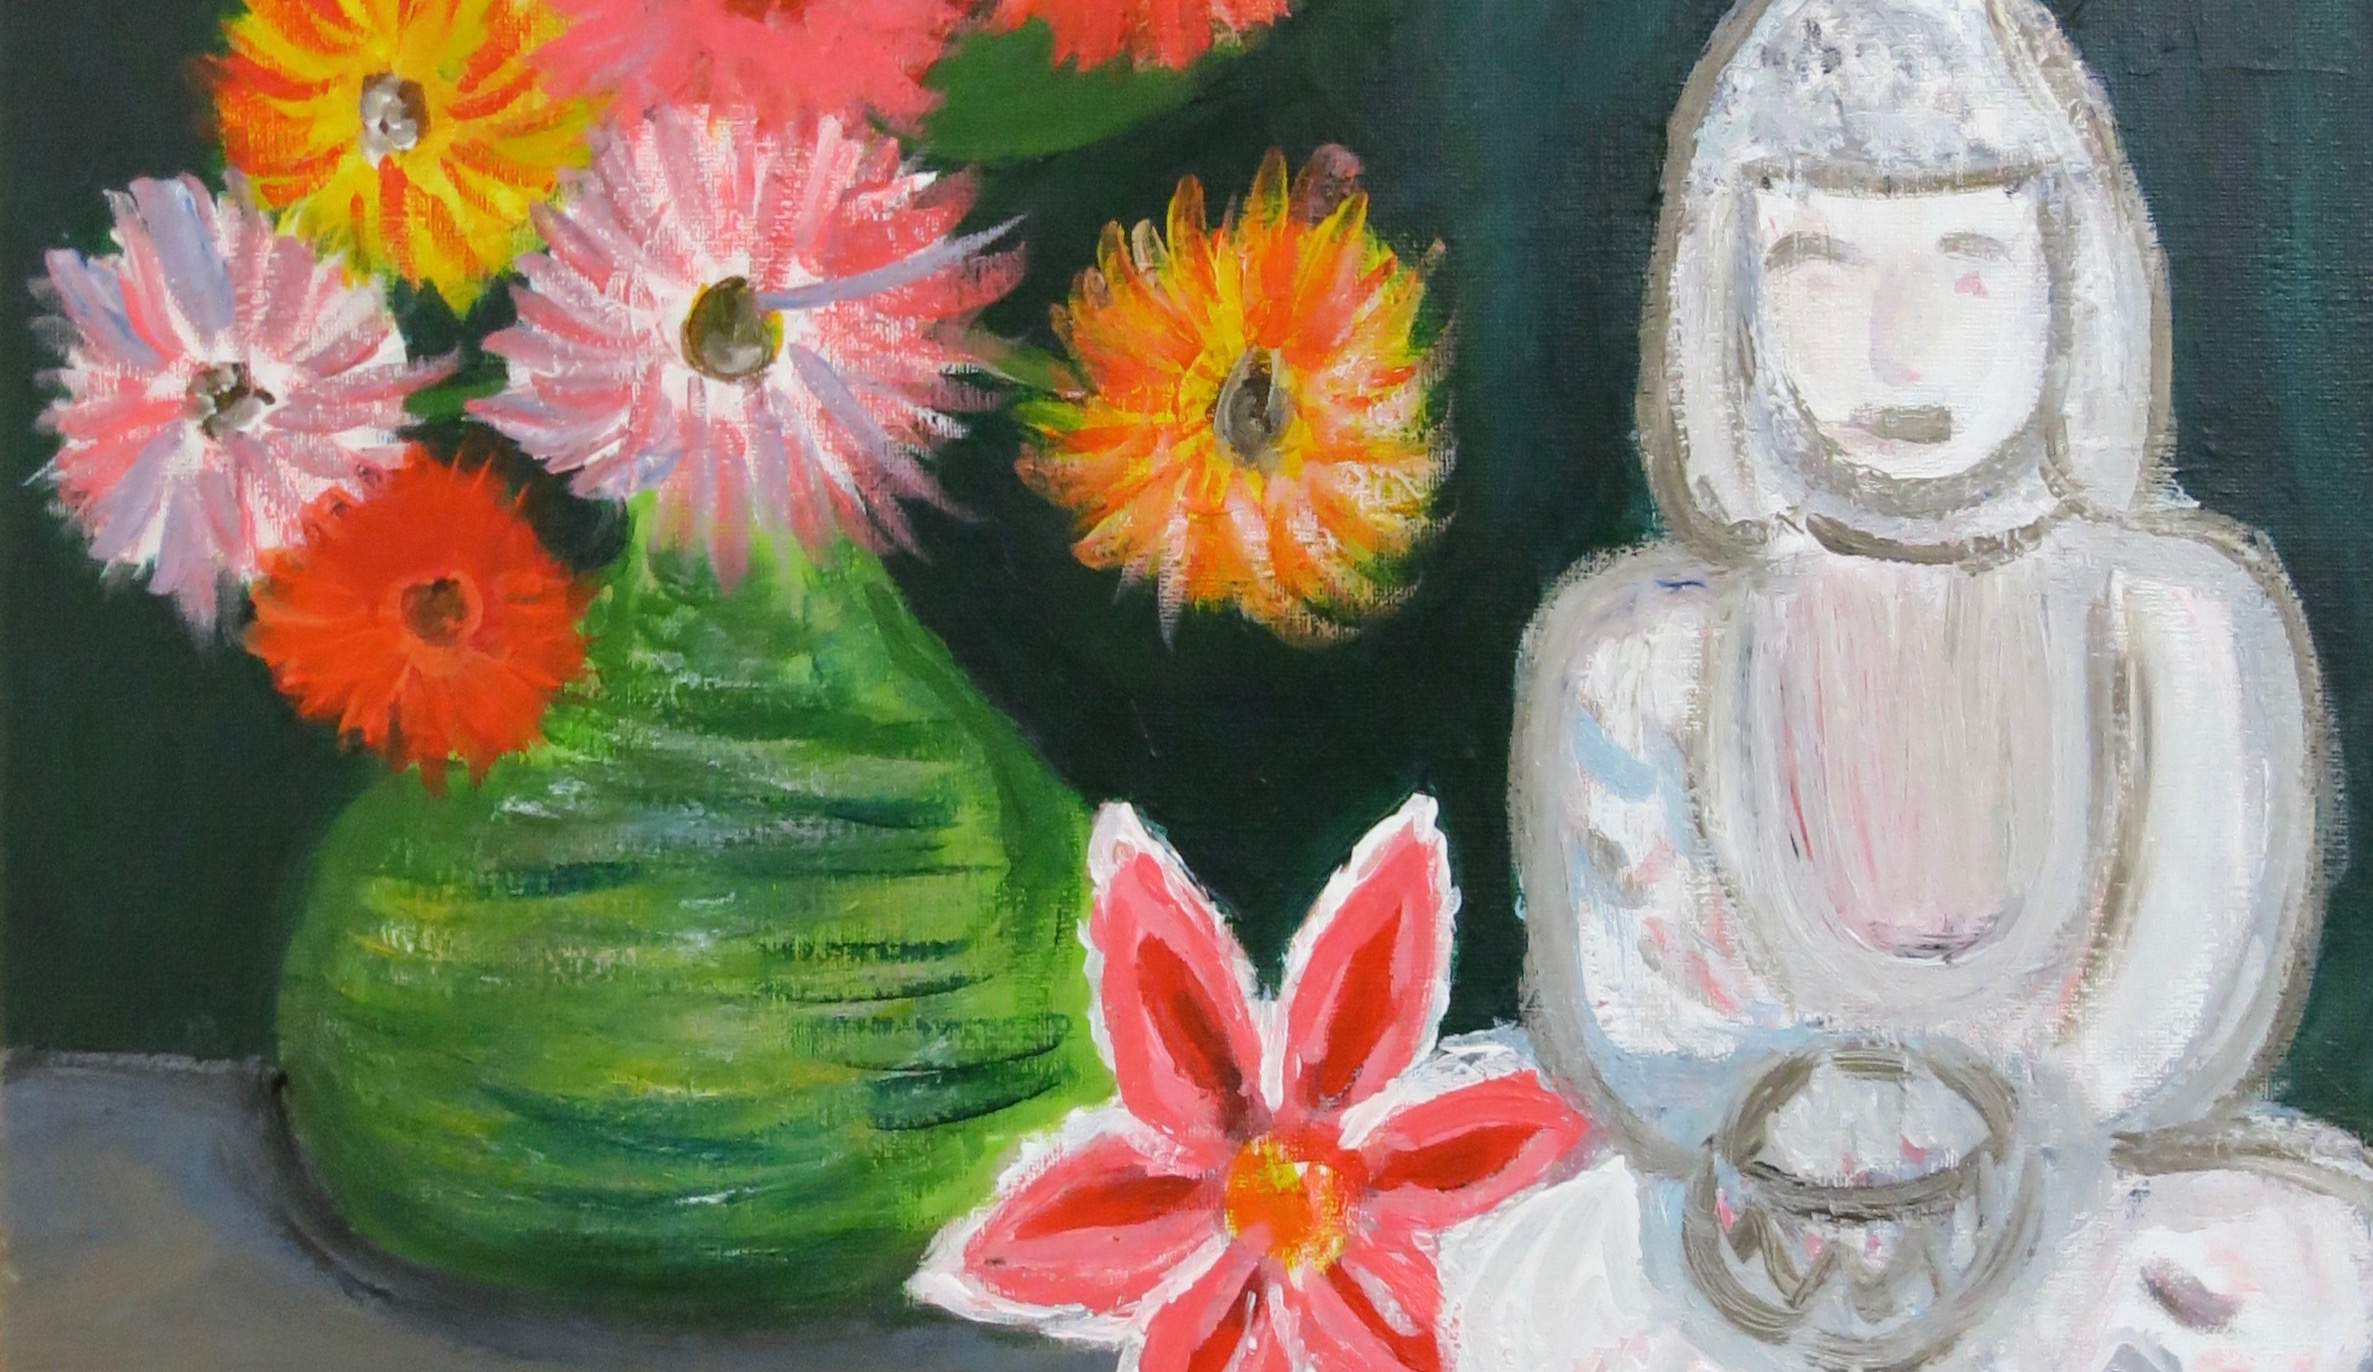 NEW! Beginner's Acrylic Painting: Make Your Mark! w/Lisa Granata (Adults 17+)